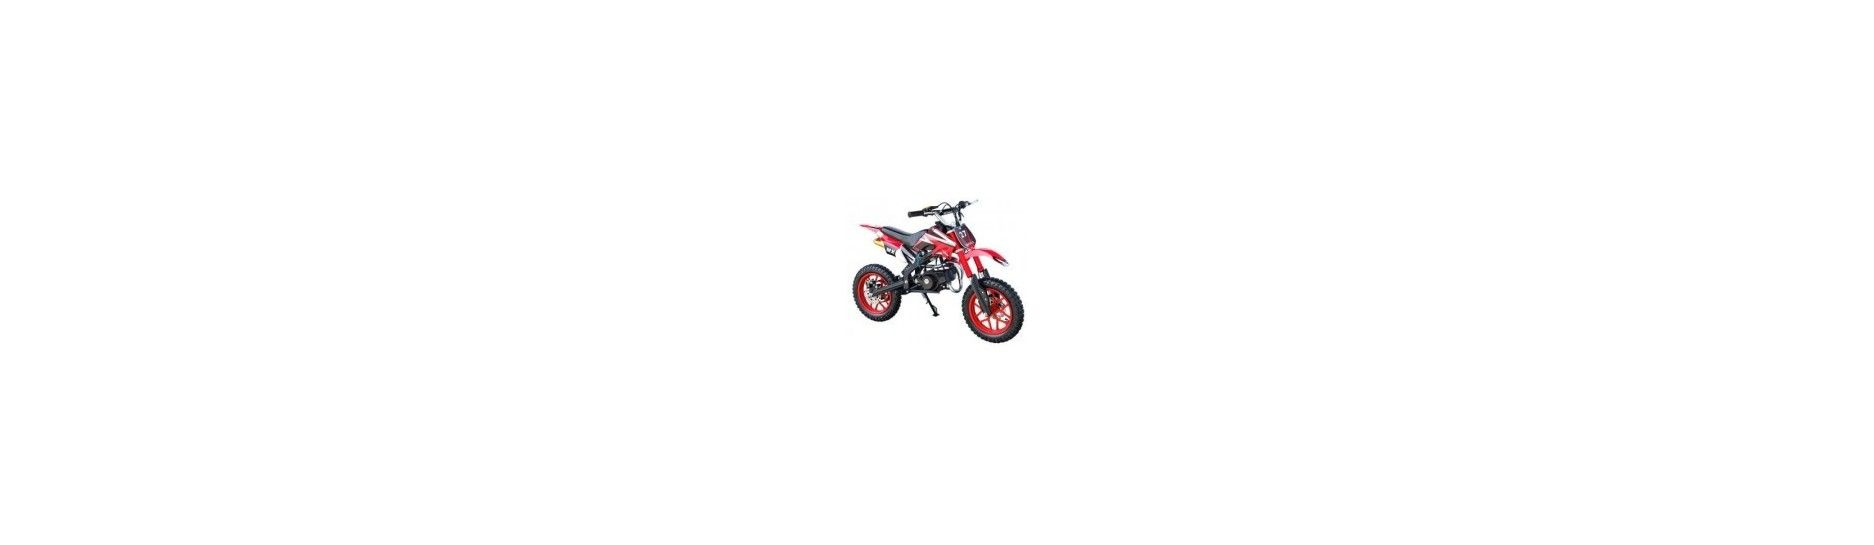 Minibike, minicross, mini ATV